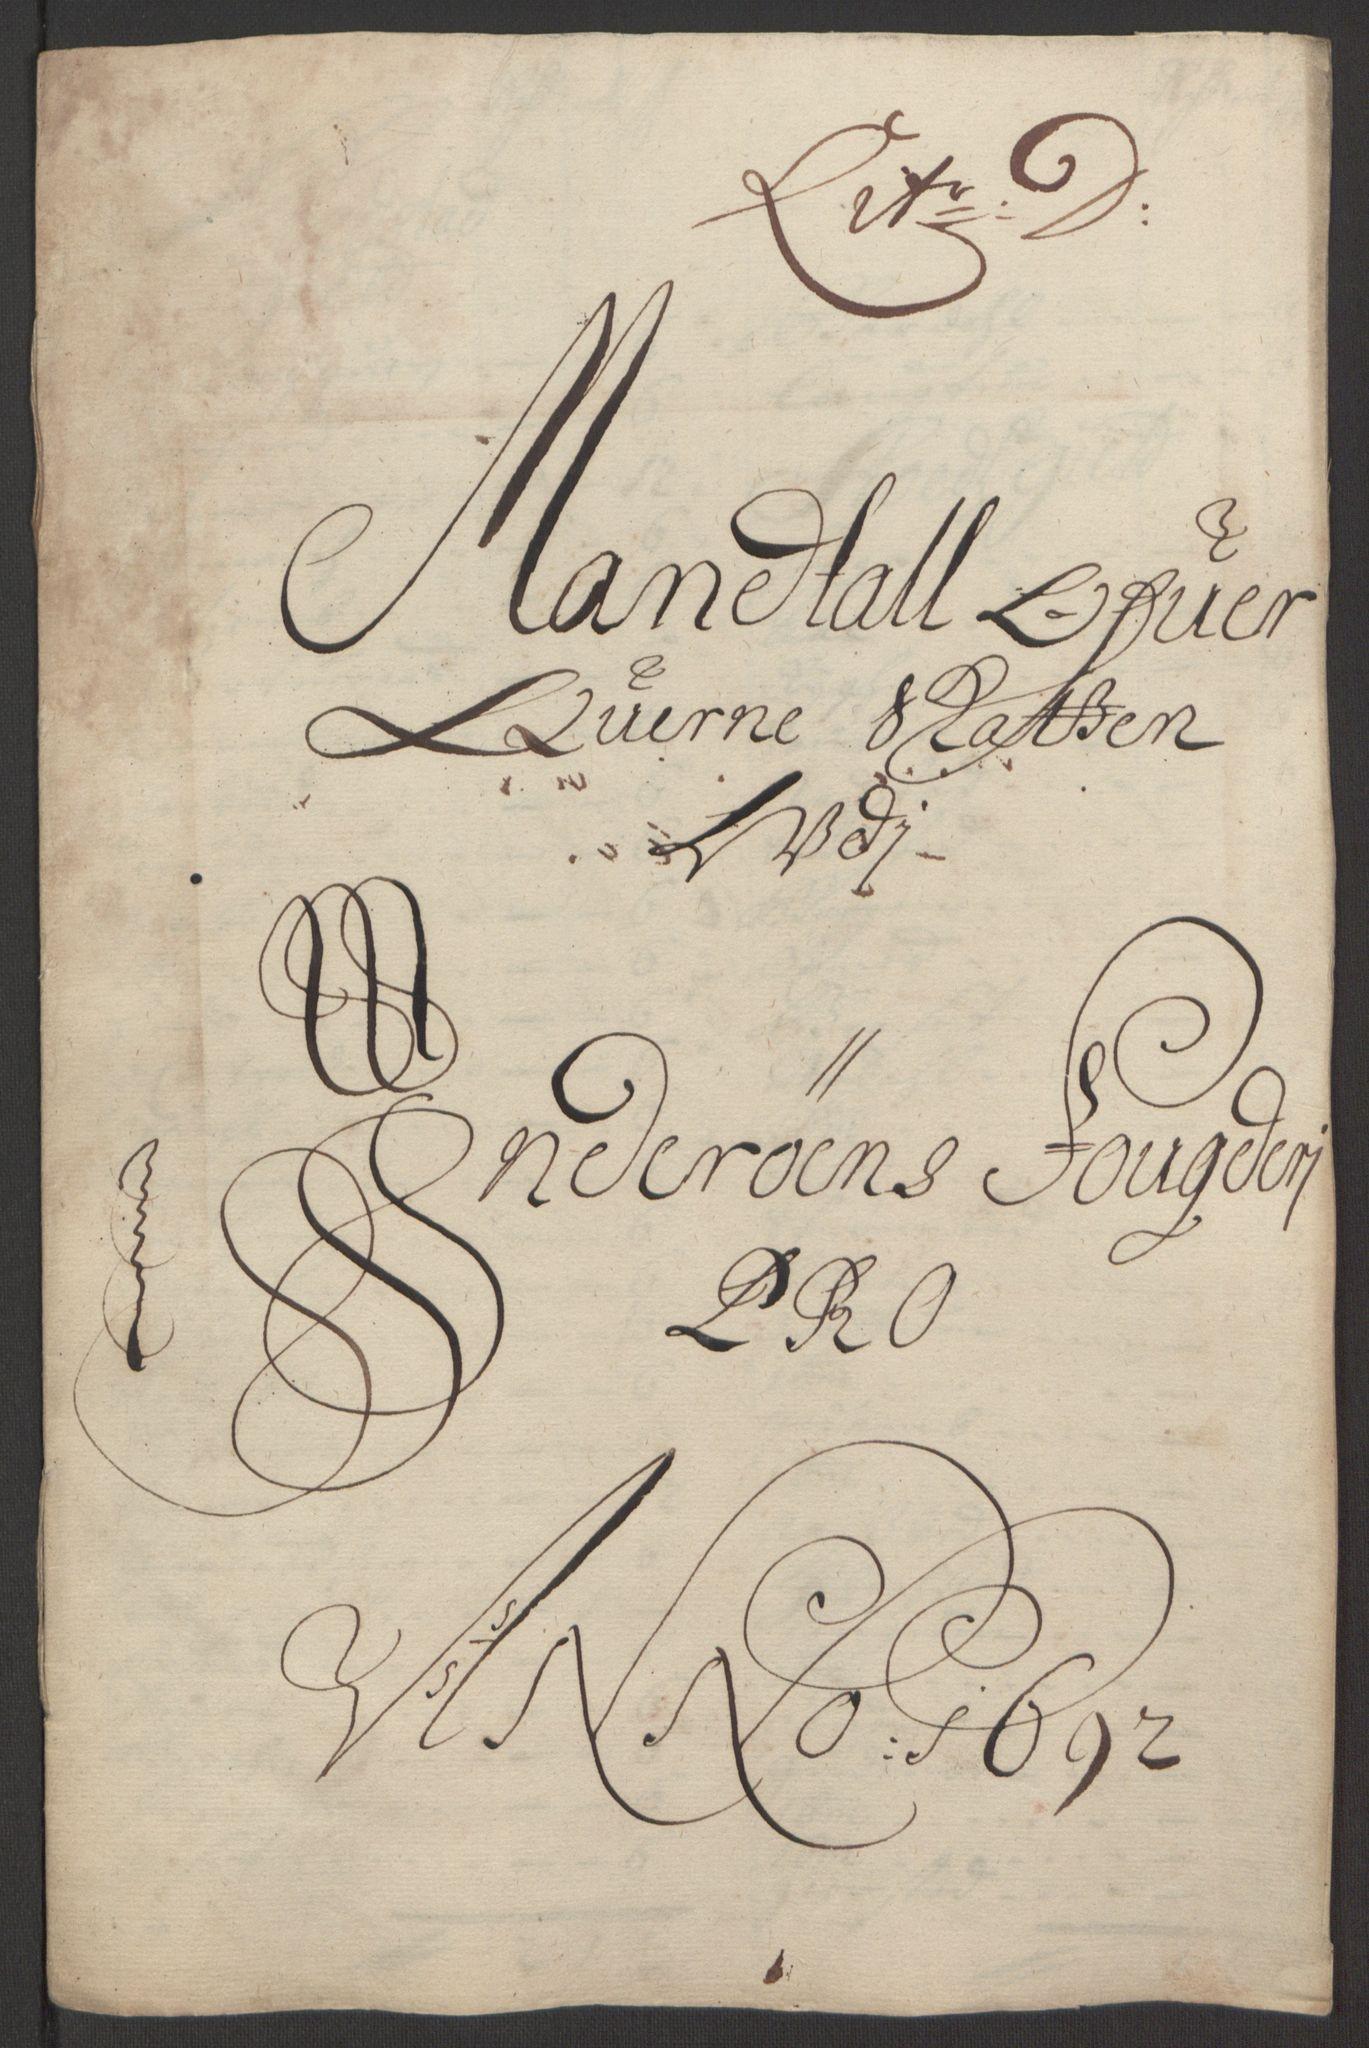 RA, Rentekammeret inntil 1814, Reviderte regnskaper, Fogderegnskap, R63/L4308: Fogderegnskap Inderøy, 1692-1694, s. 77